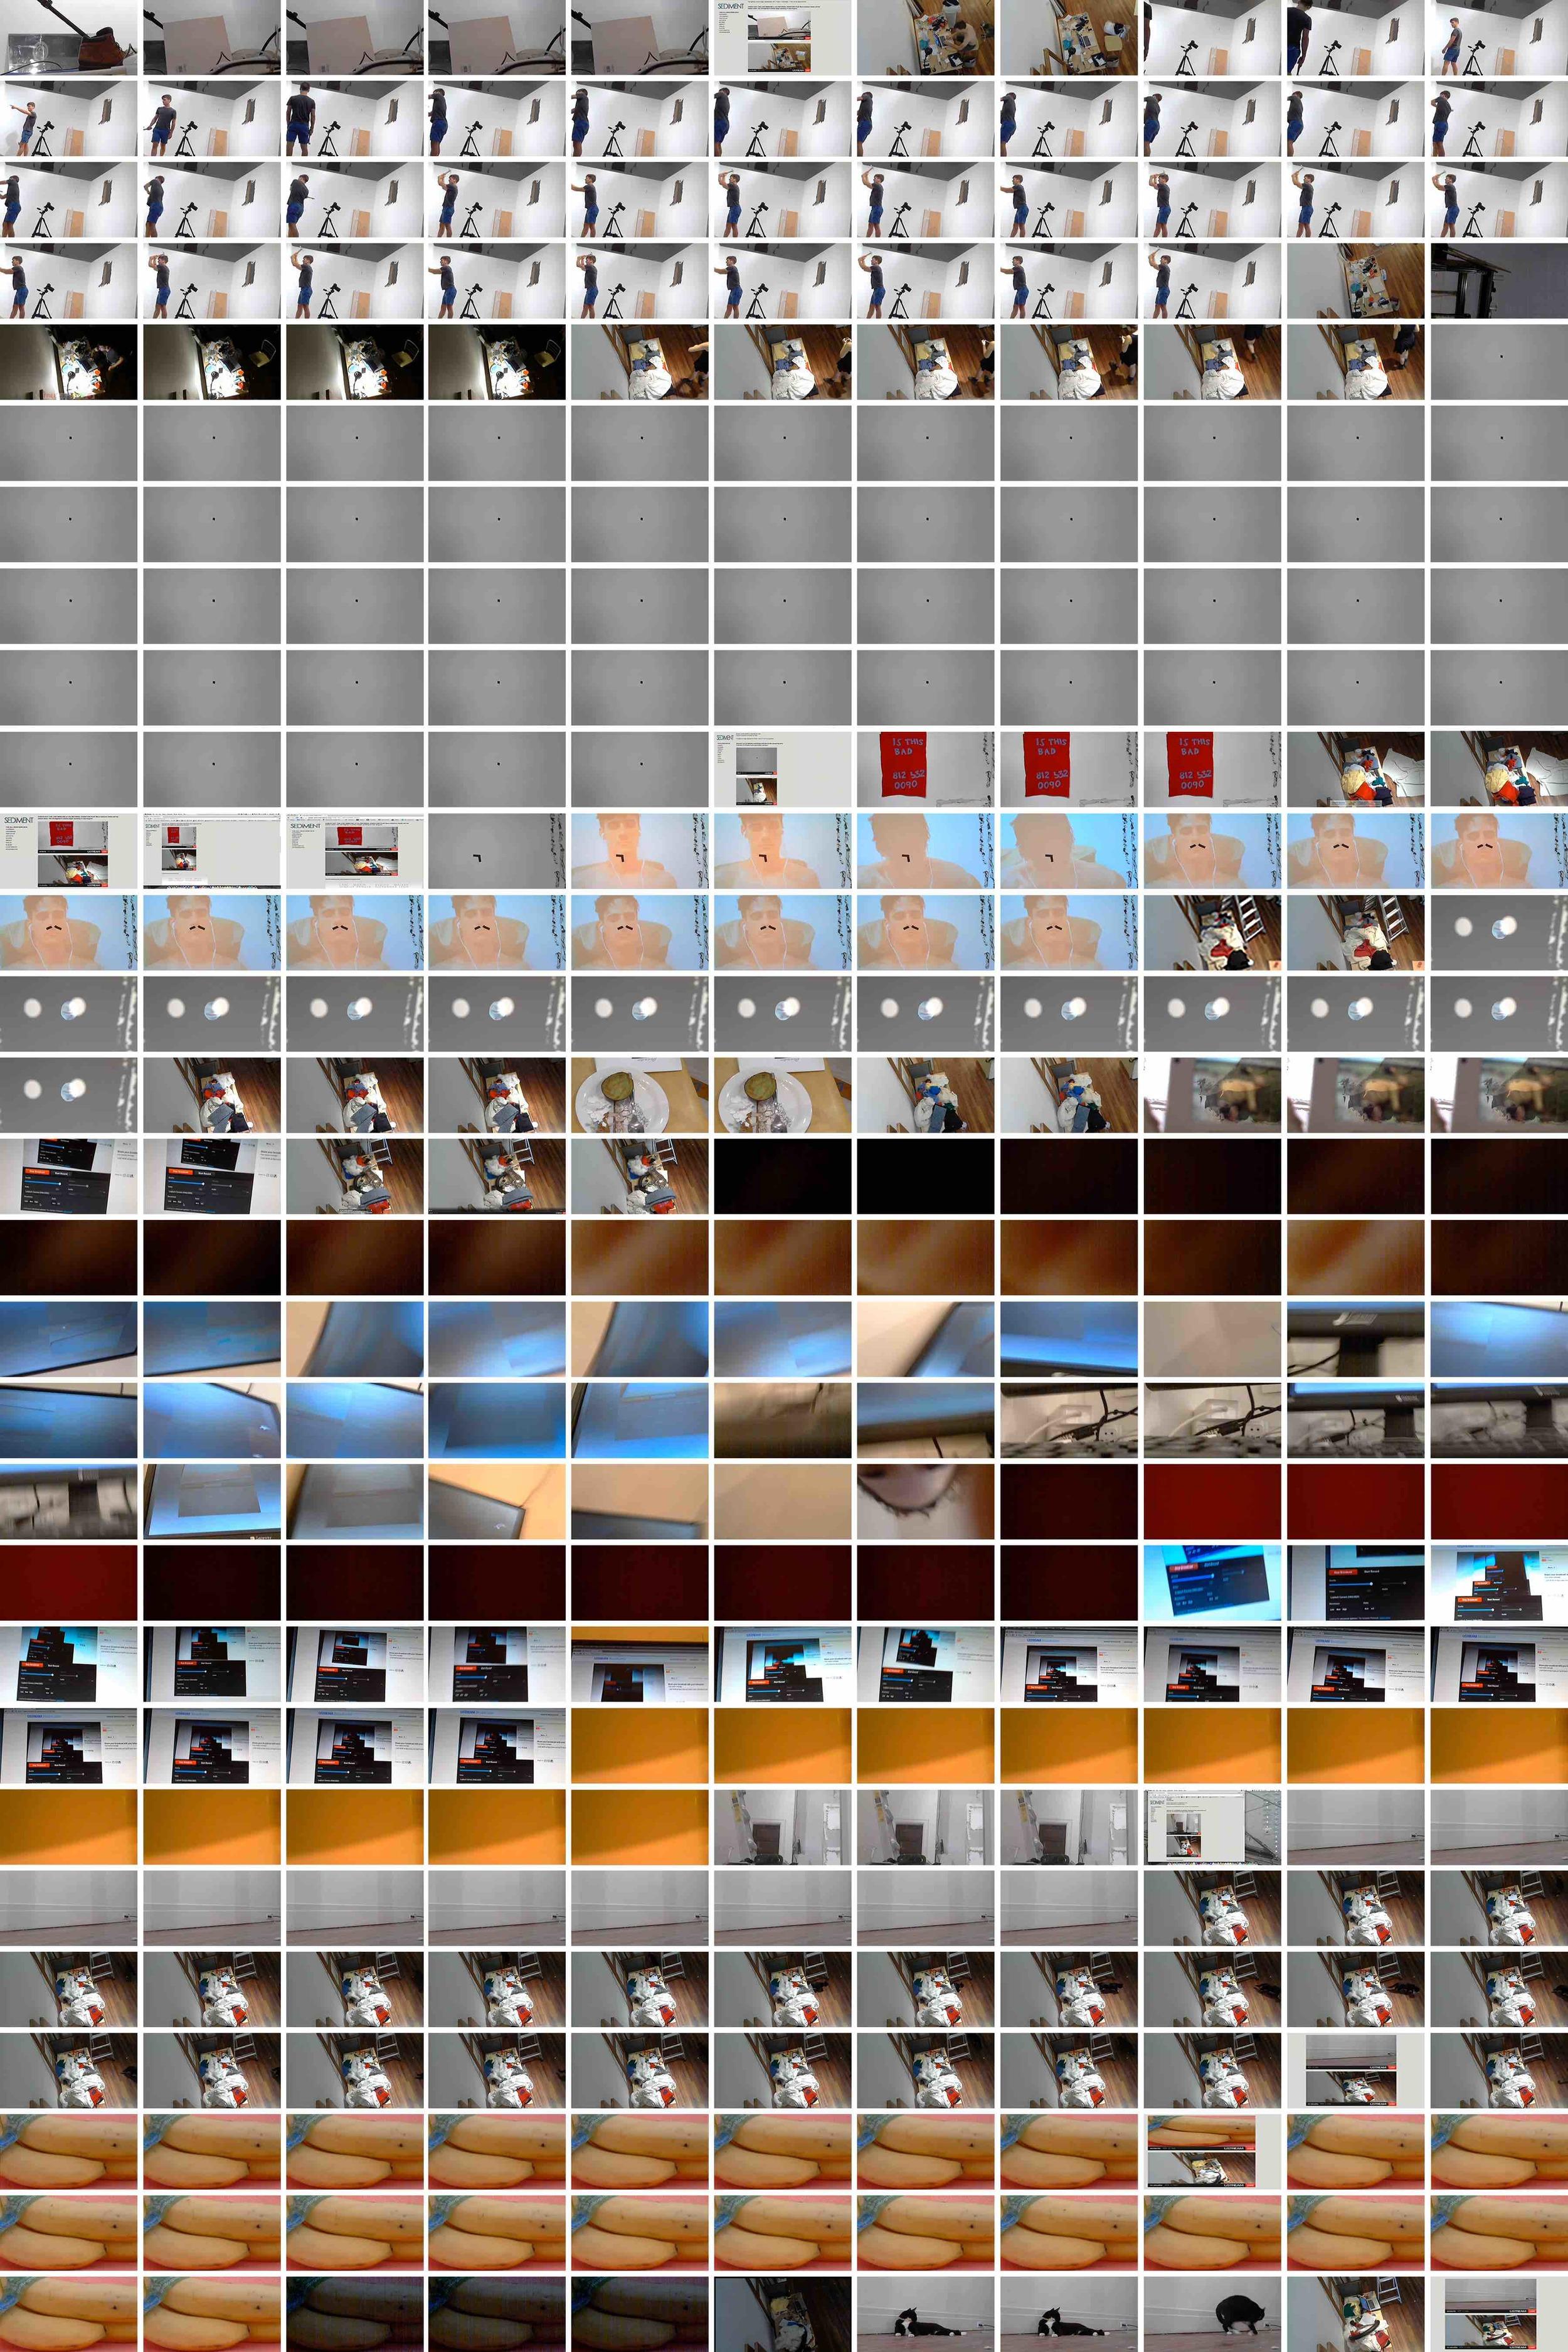 All-Nighter's Screenshot_Grid_PRINT.jpg